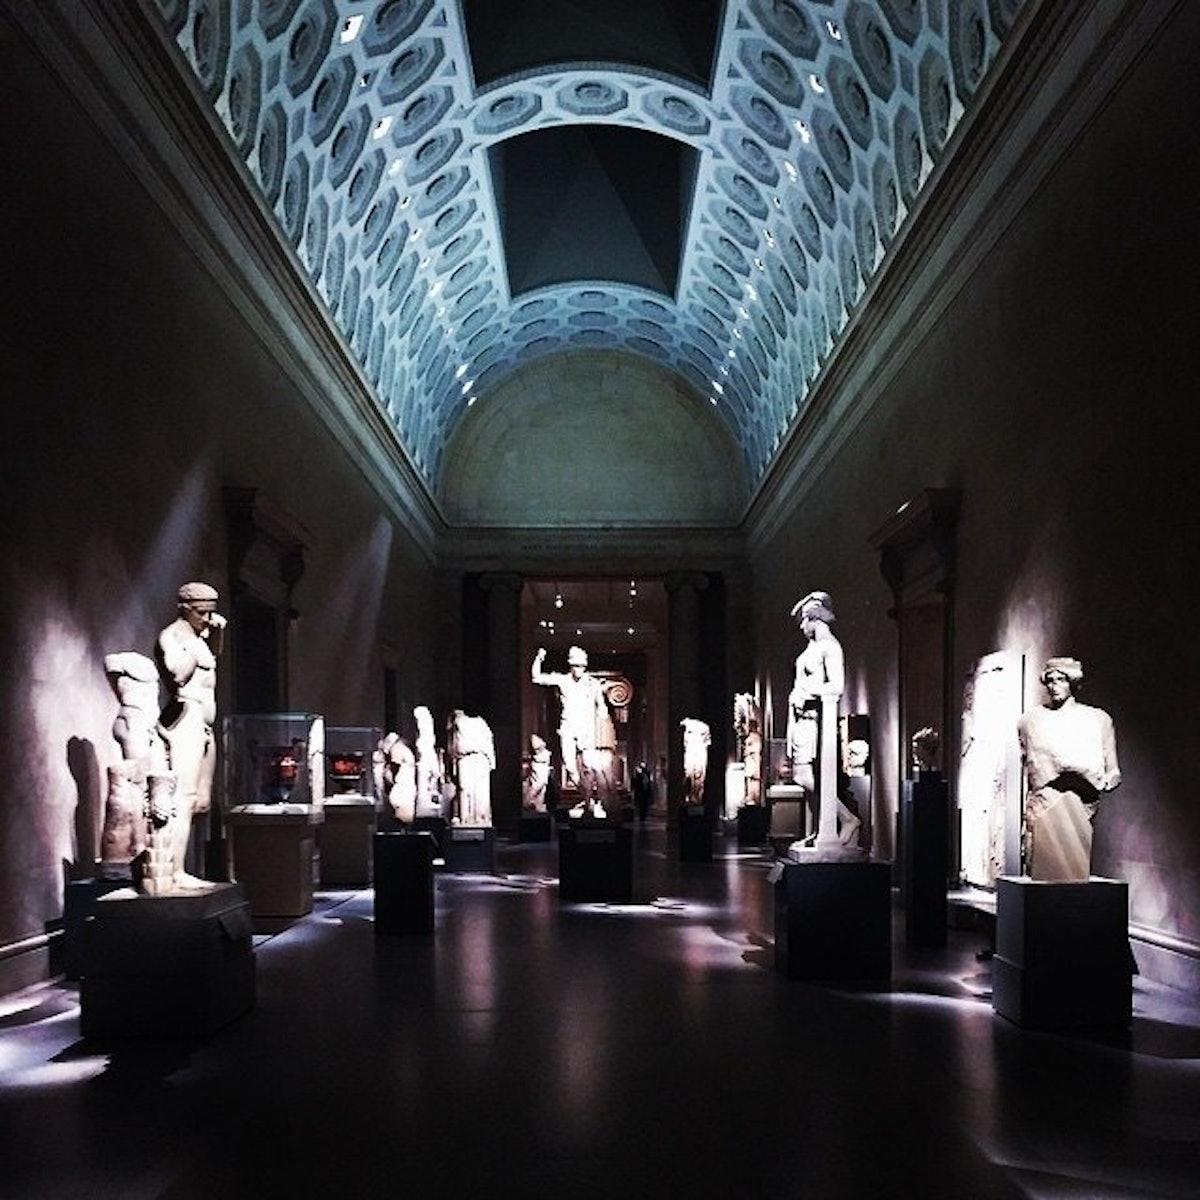 The Metropolitan Museum of Art, New York by lucefiasco